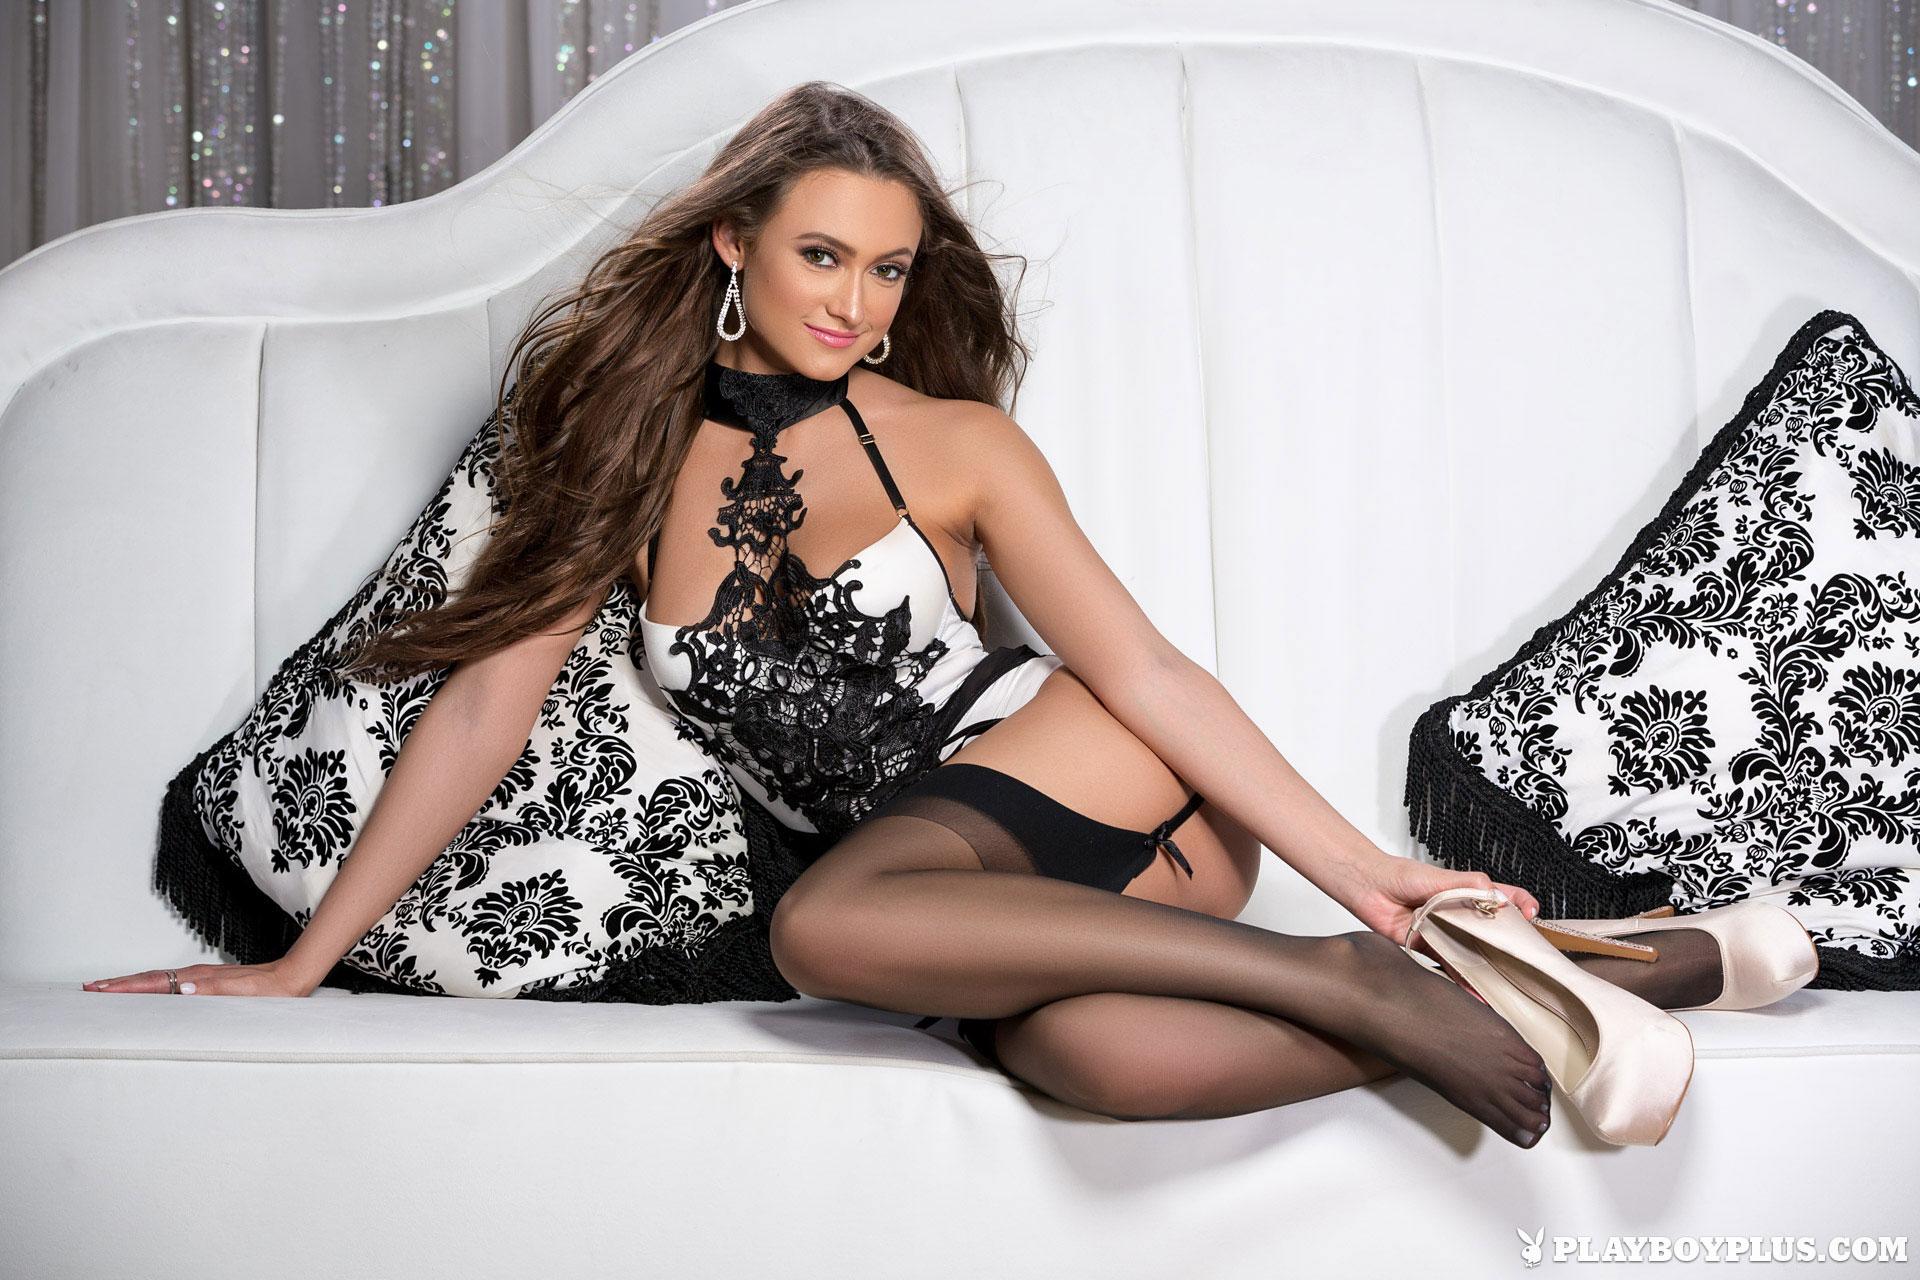 deanna-greene-stockings-garters-nude-playboy-04